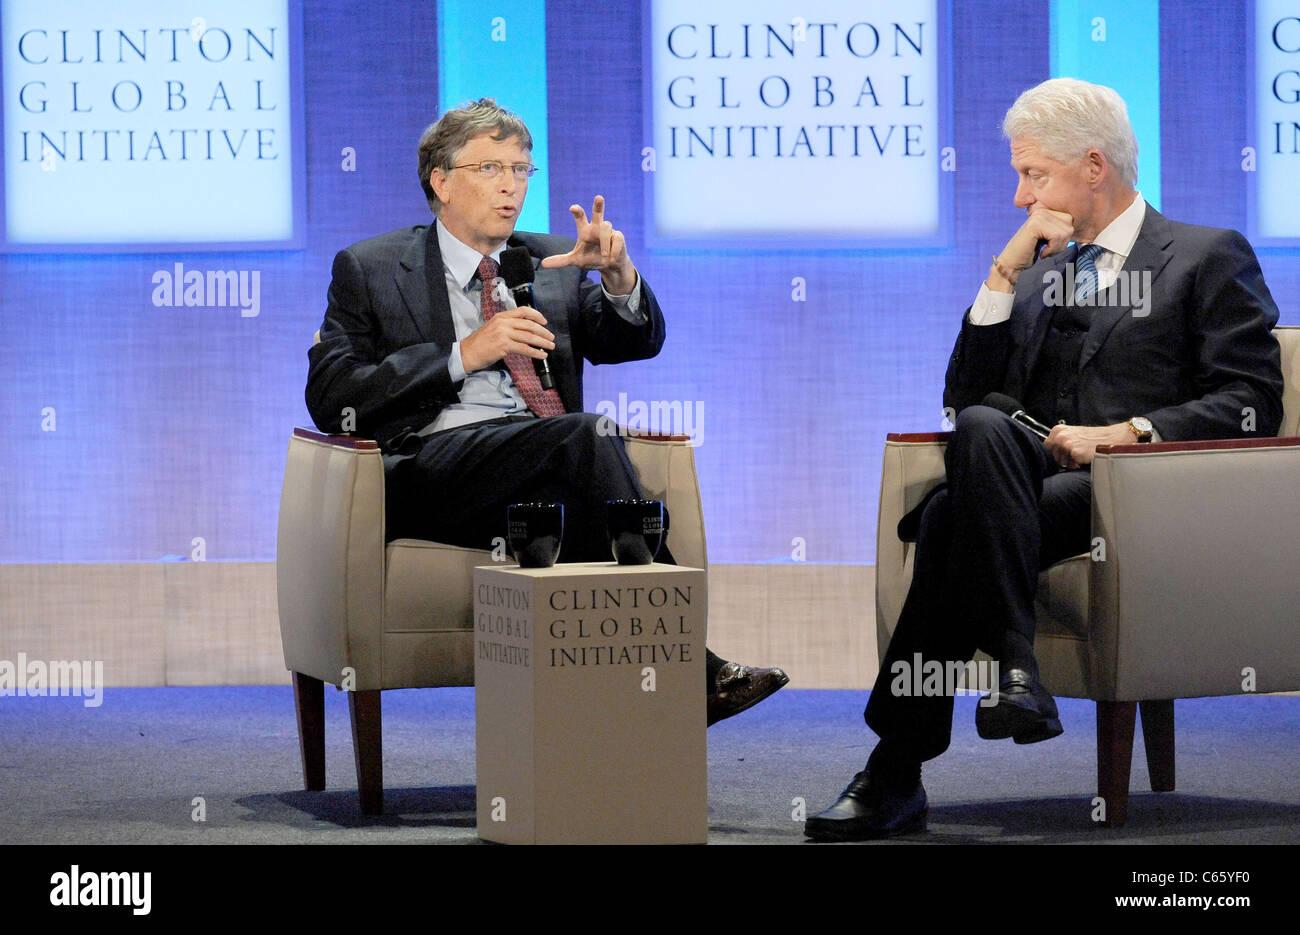 Bill Gates, Bill Clinton in Anwesenheit für jährliche Clinton Global Initiative (CGI), New York, NY 23. Stockbild